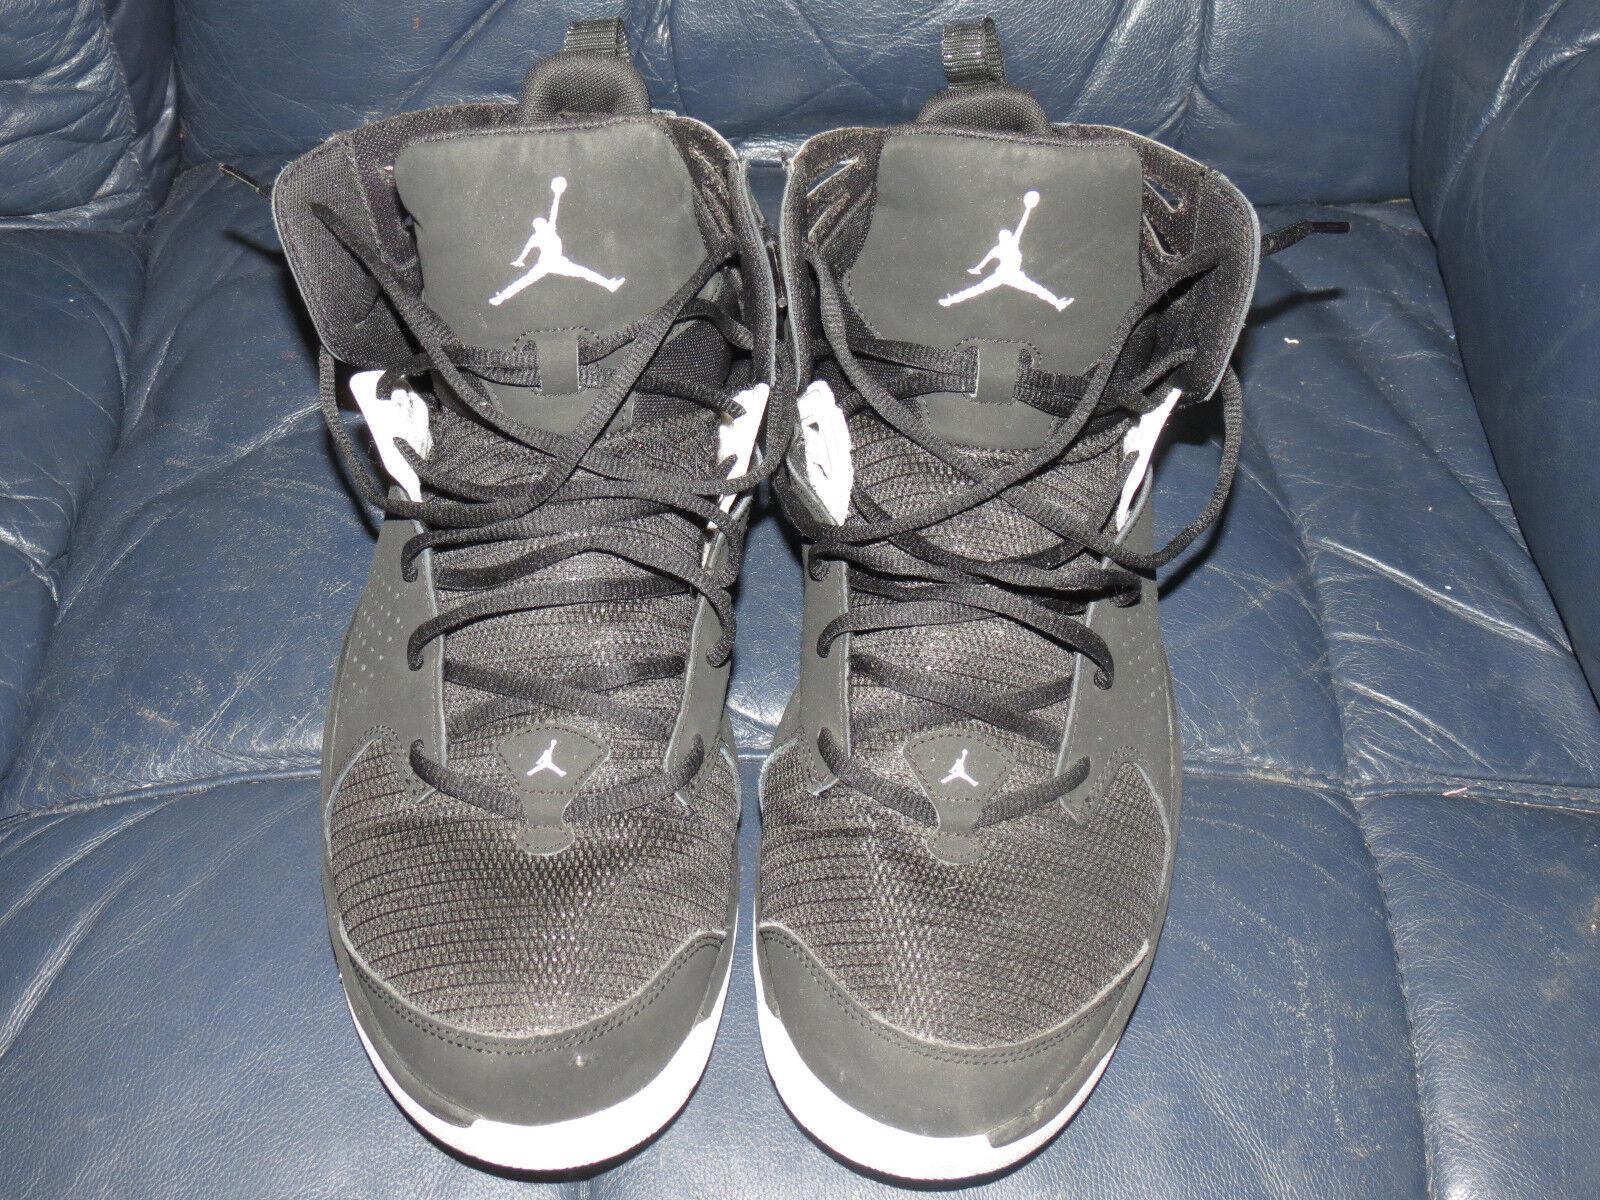 Nike Jordan Ace 23 II 644773-010 Air Sole Basketball Shoes (D, M) New Sz 13